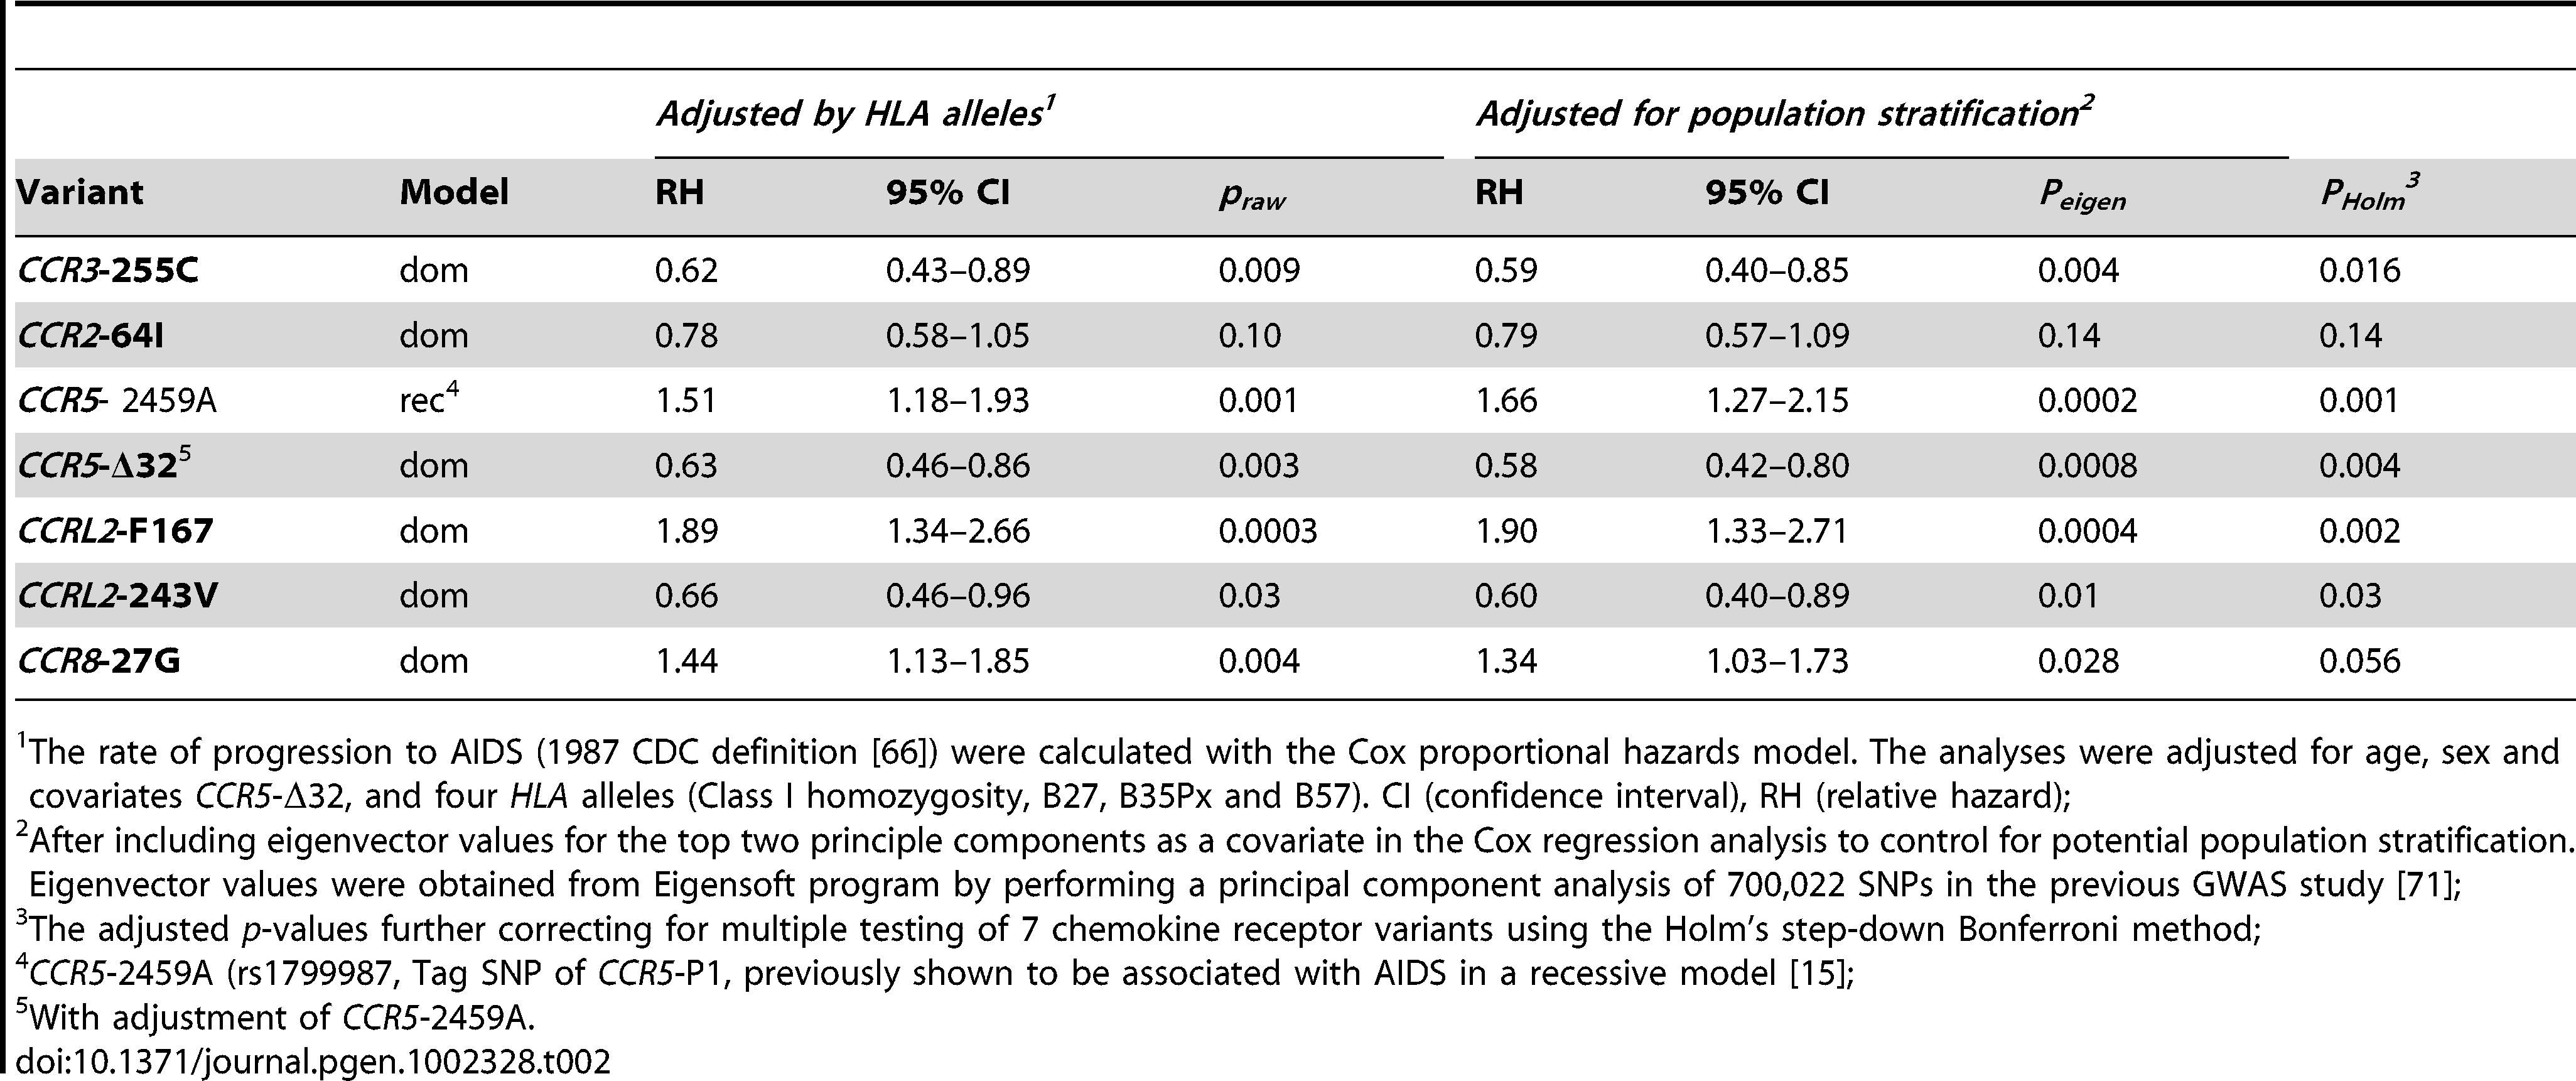 Effects of chemokine receptor variants on AIDS progression.